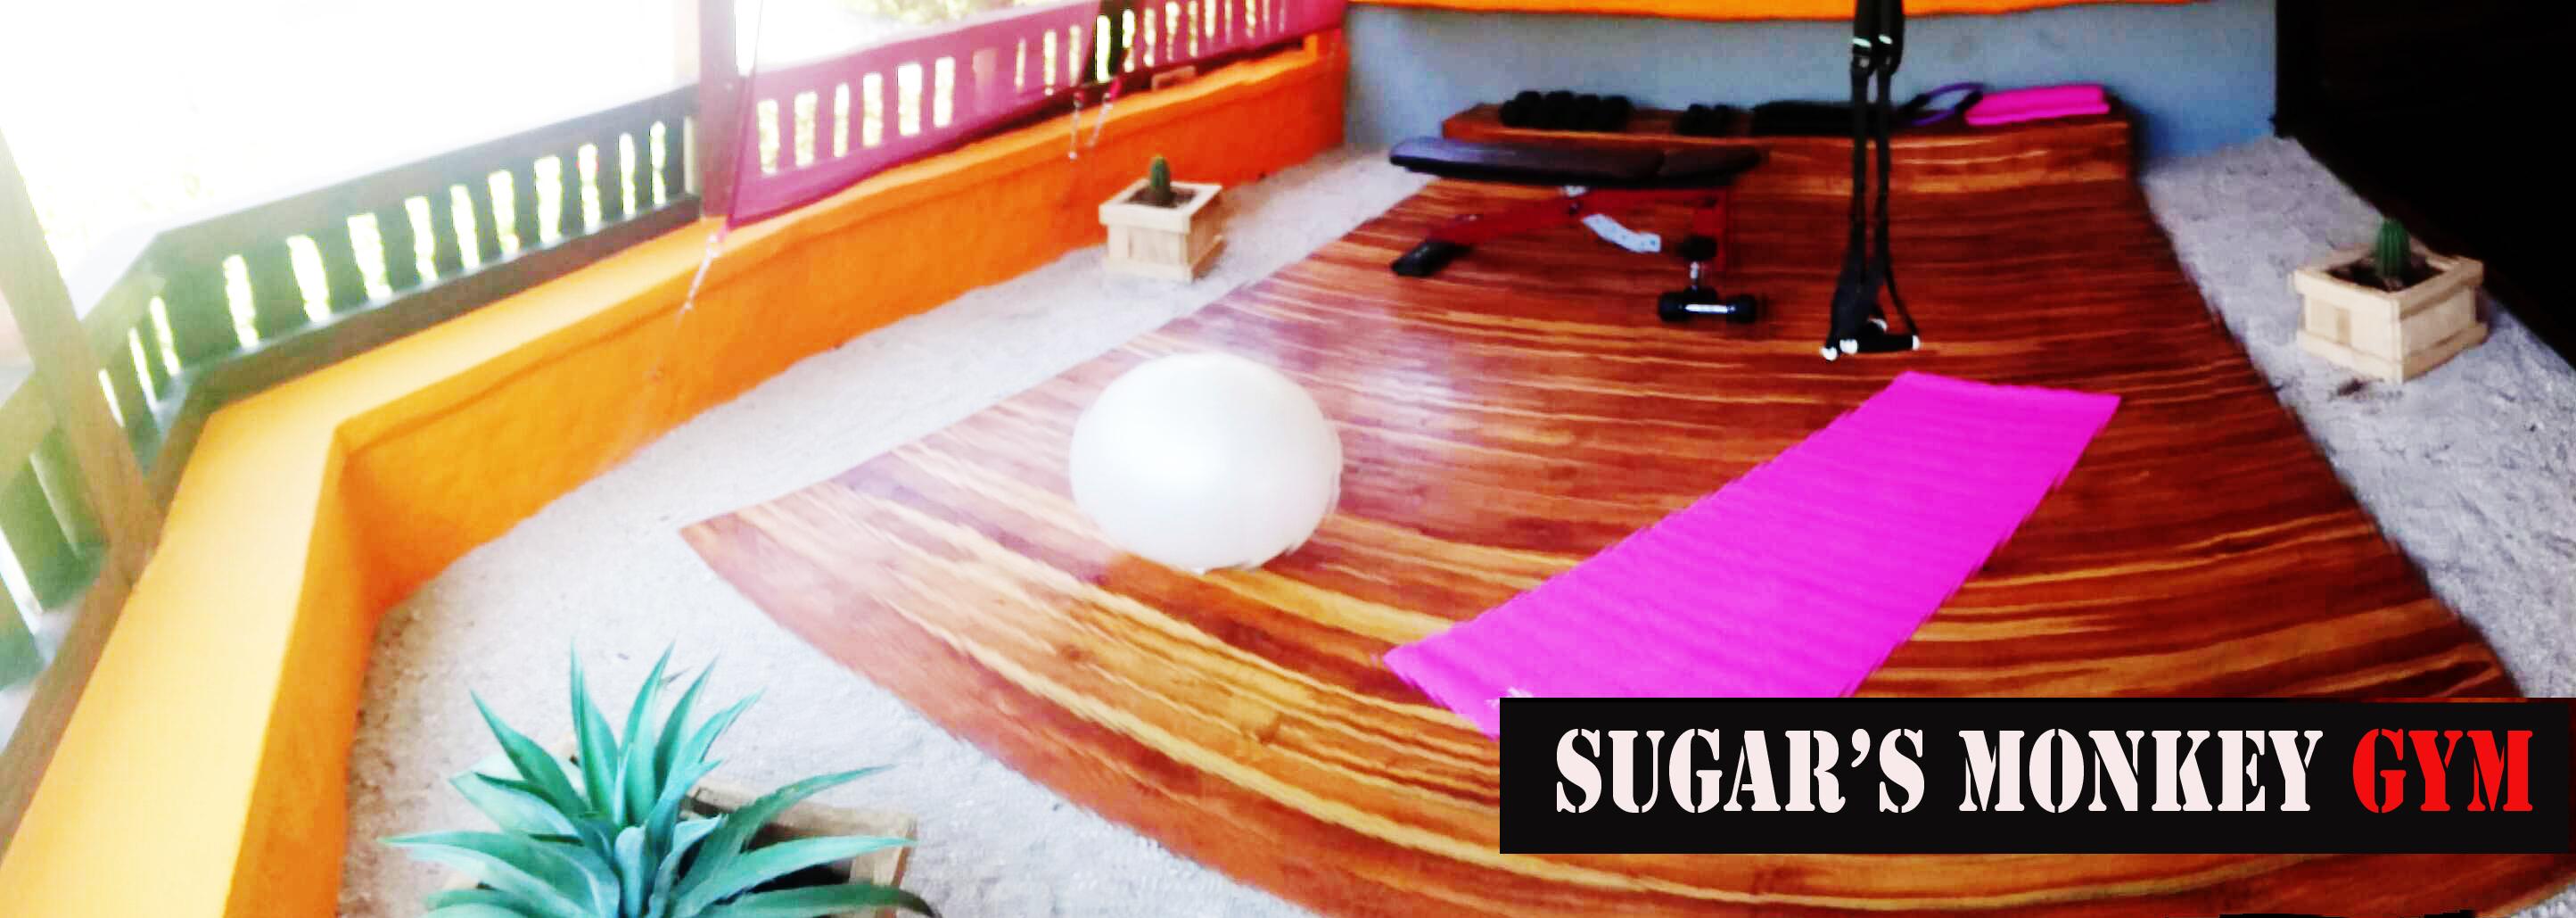 gym_space_2_sugars_monkey_playa_grande_surf_poshtel_hotel_surf_school_trip_surfcamp_costa_rica_tamar